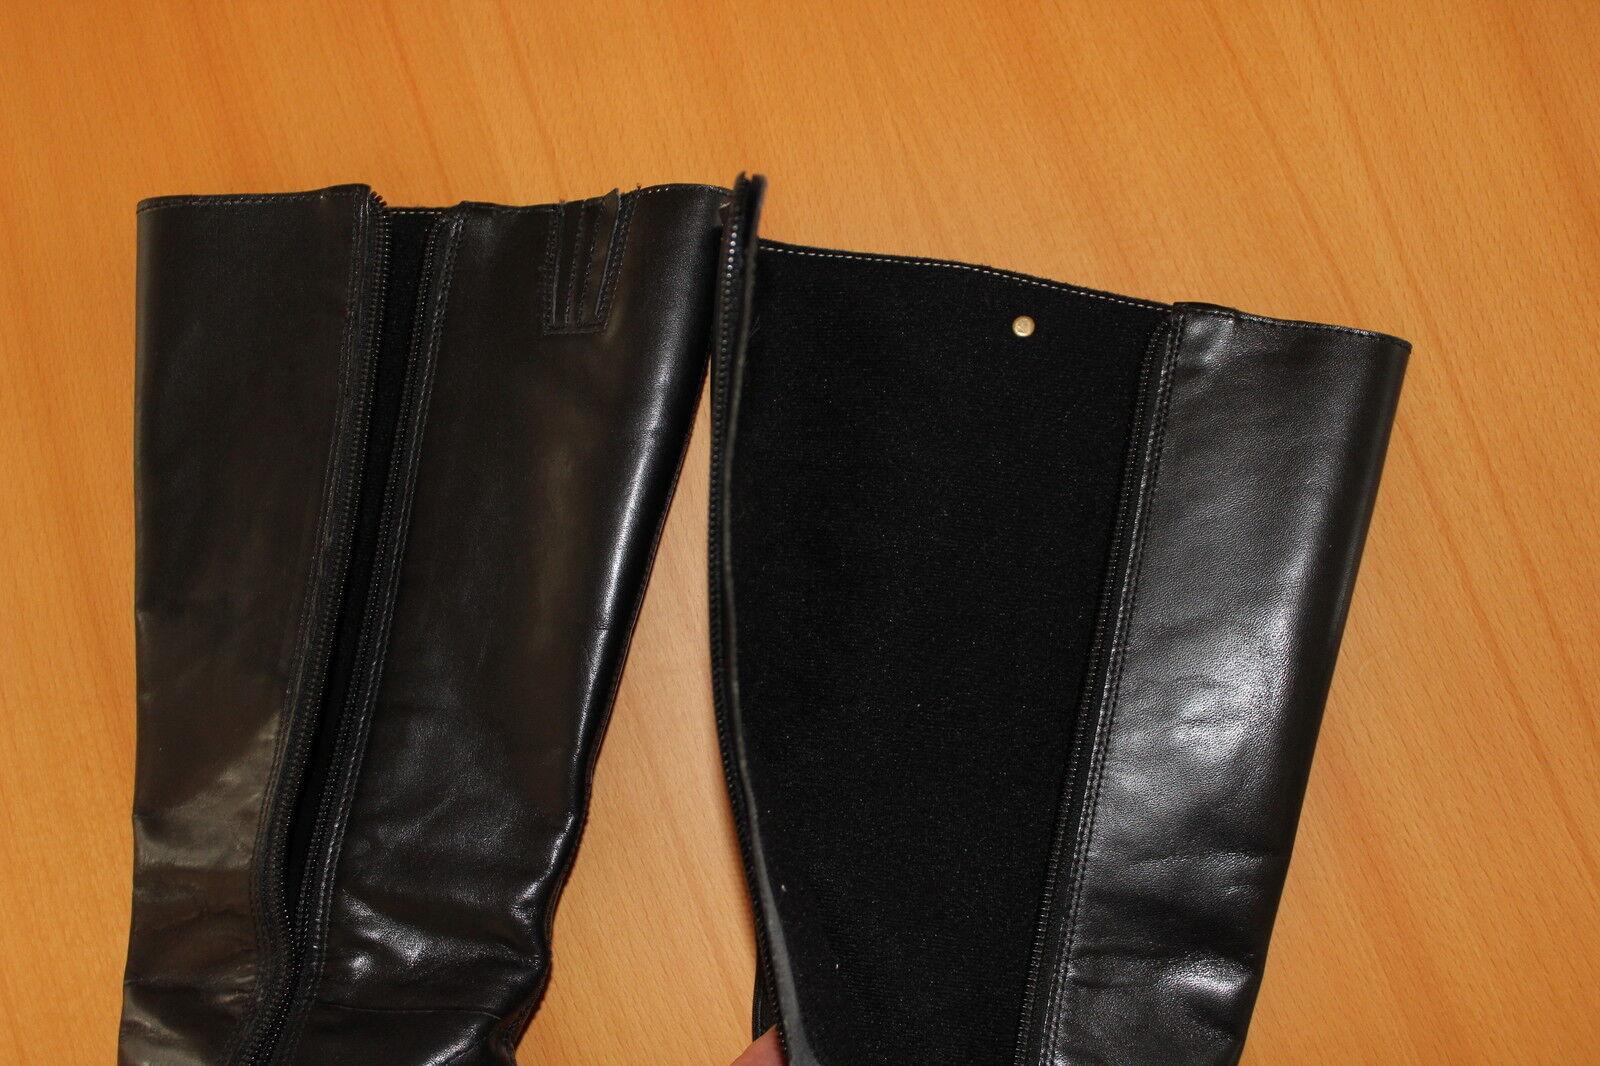 Damen Stiefel Buffalo Farbe: Echtleder Gr. 36 Farbe: Buffalo schwarz NEUWERTIG 19c278